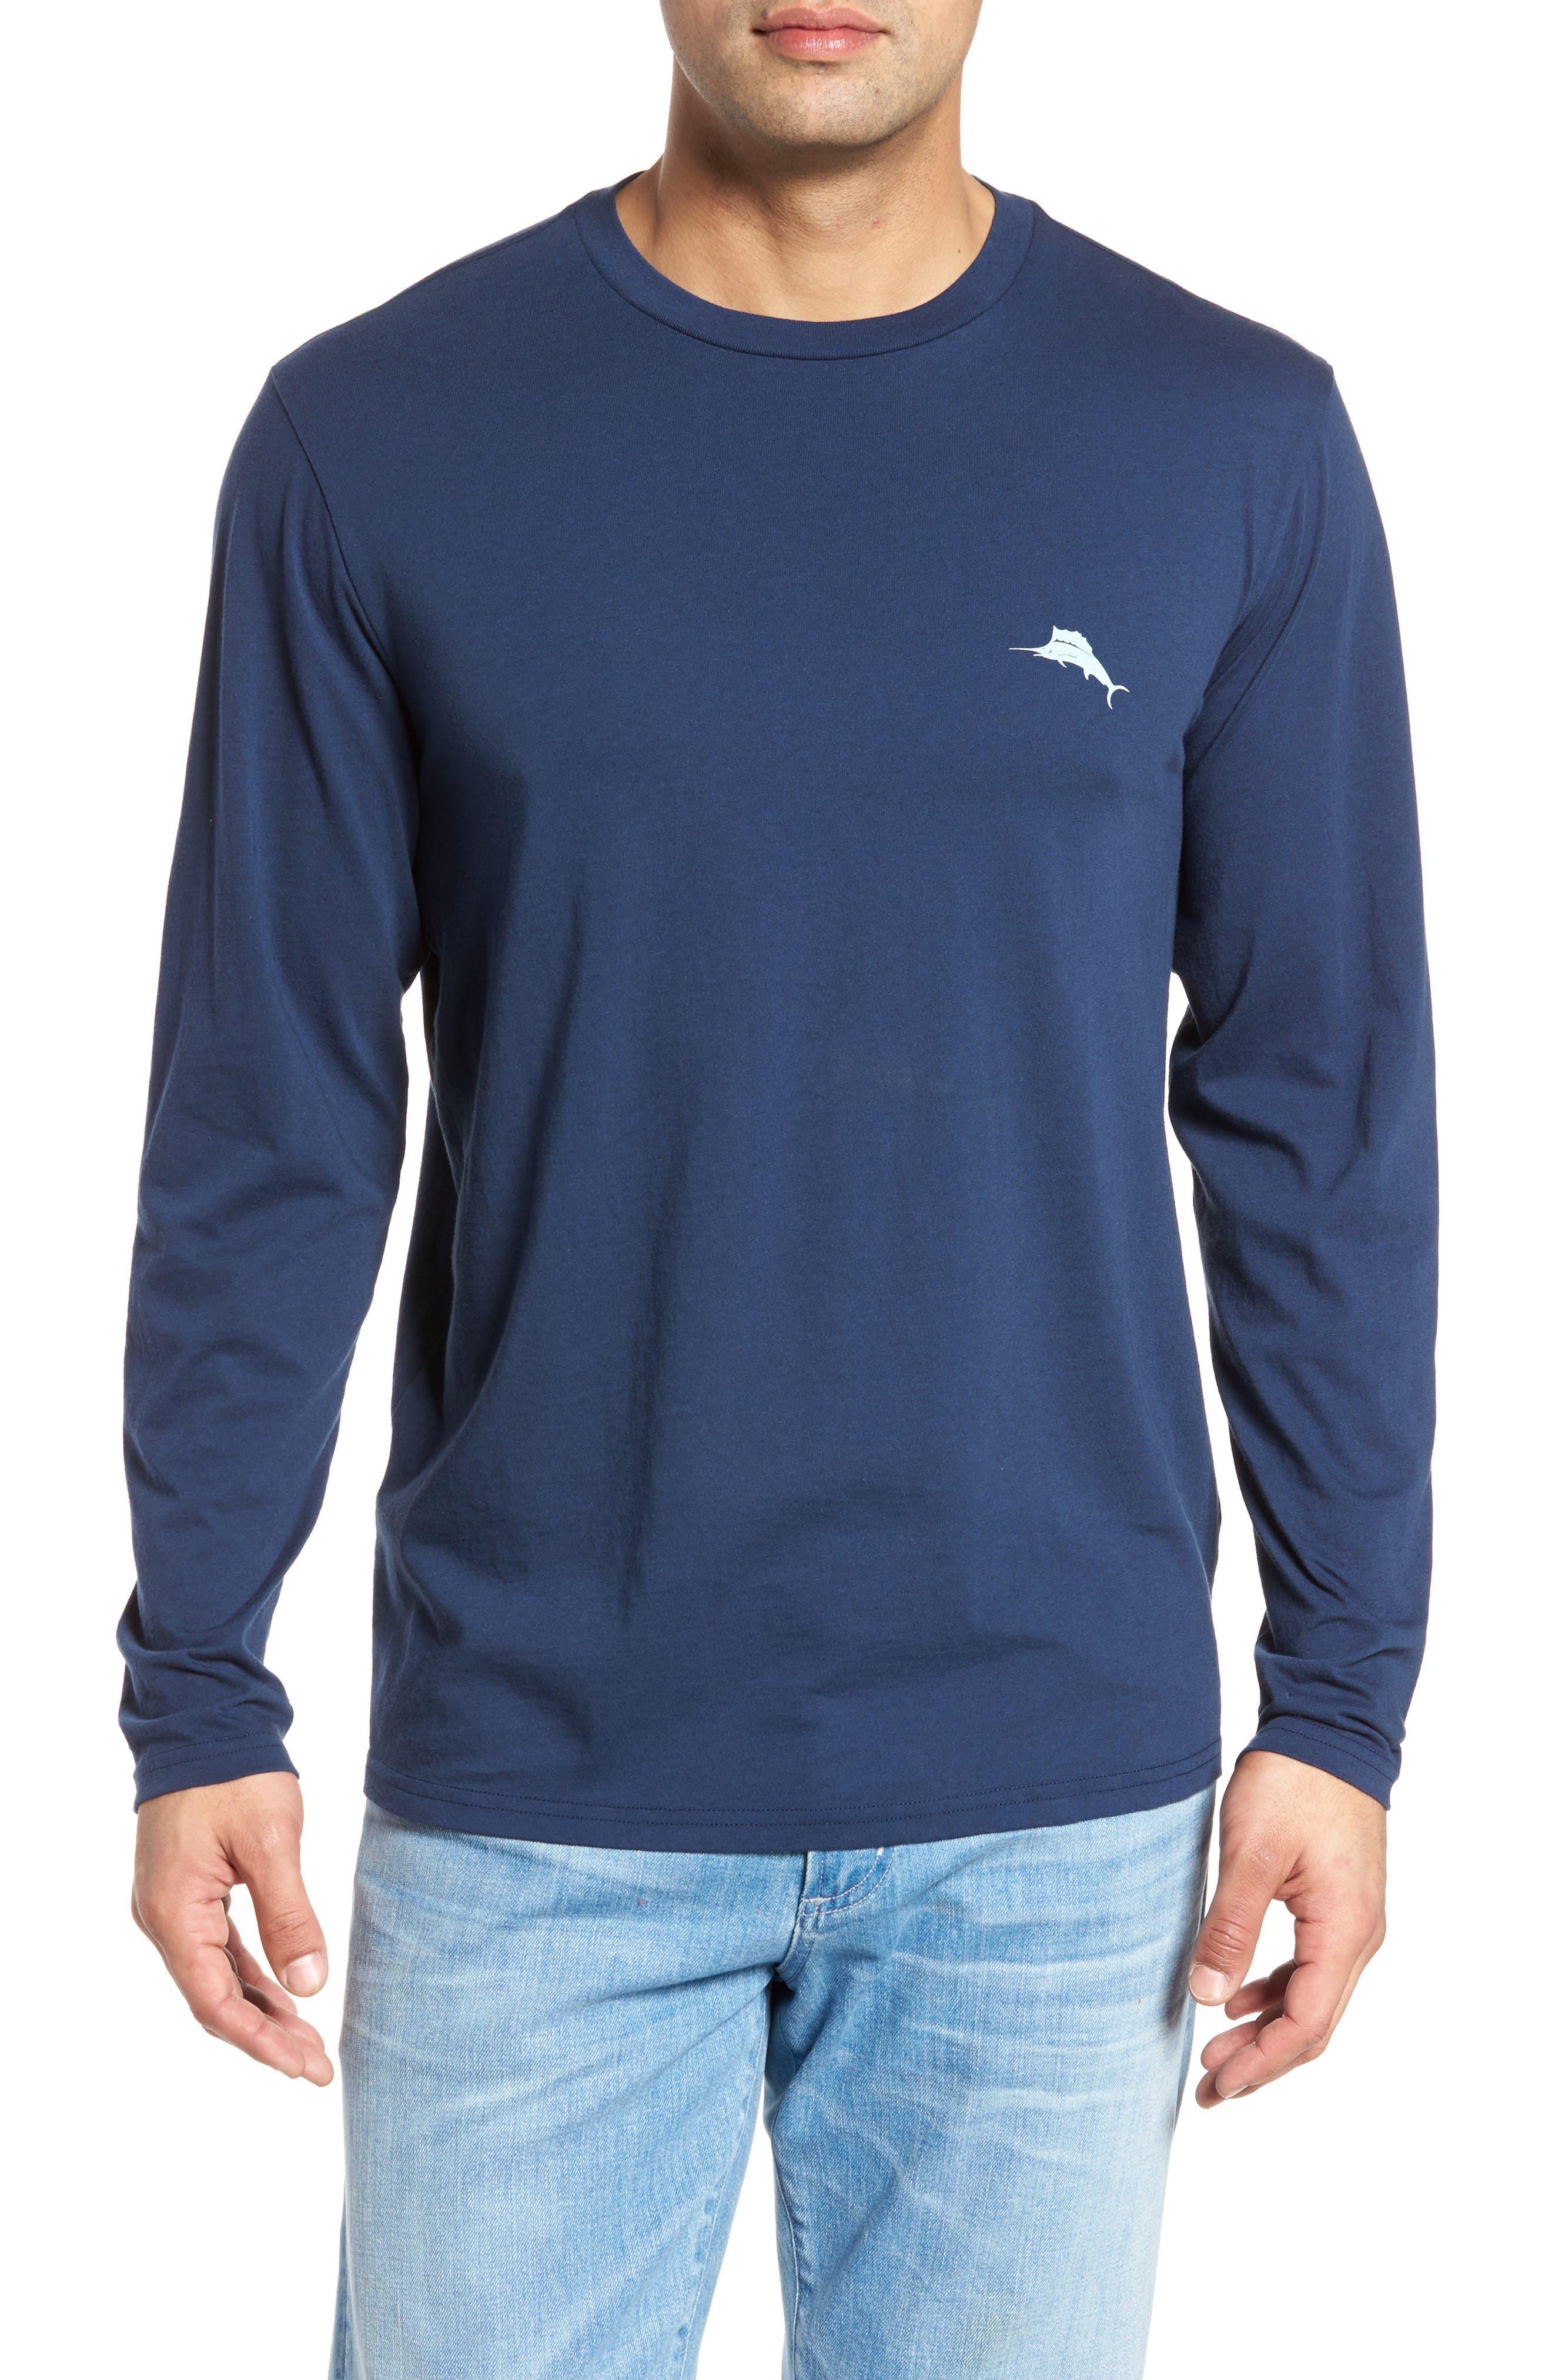 Diamond Isle Graphic T-Shirt,                             Alternate thumbnail 2, color,                             Navy